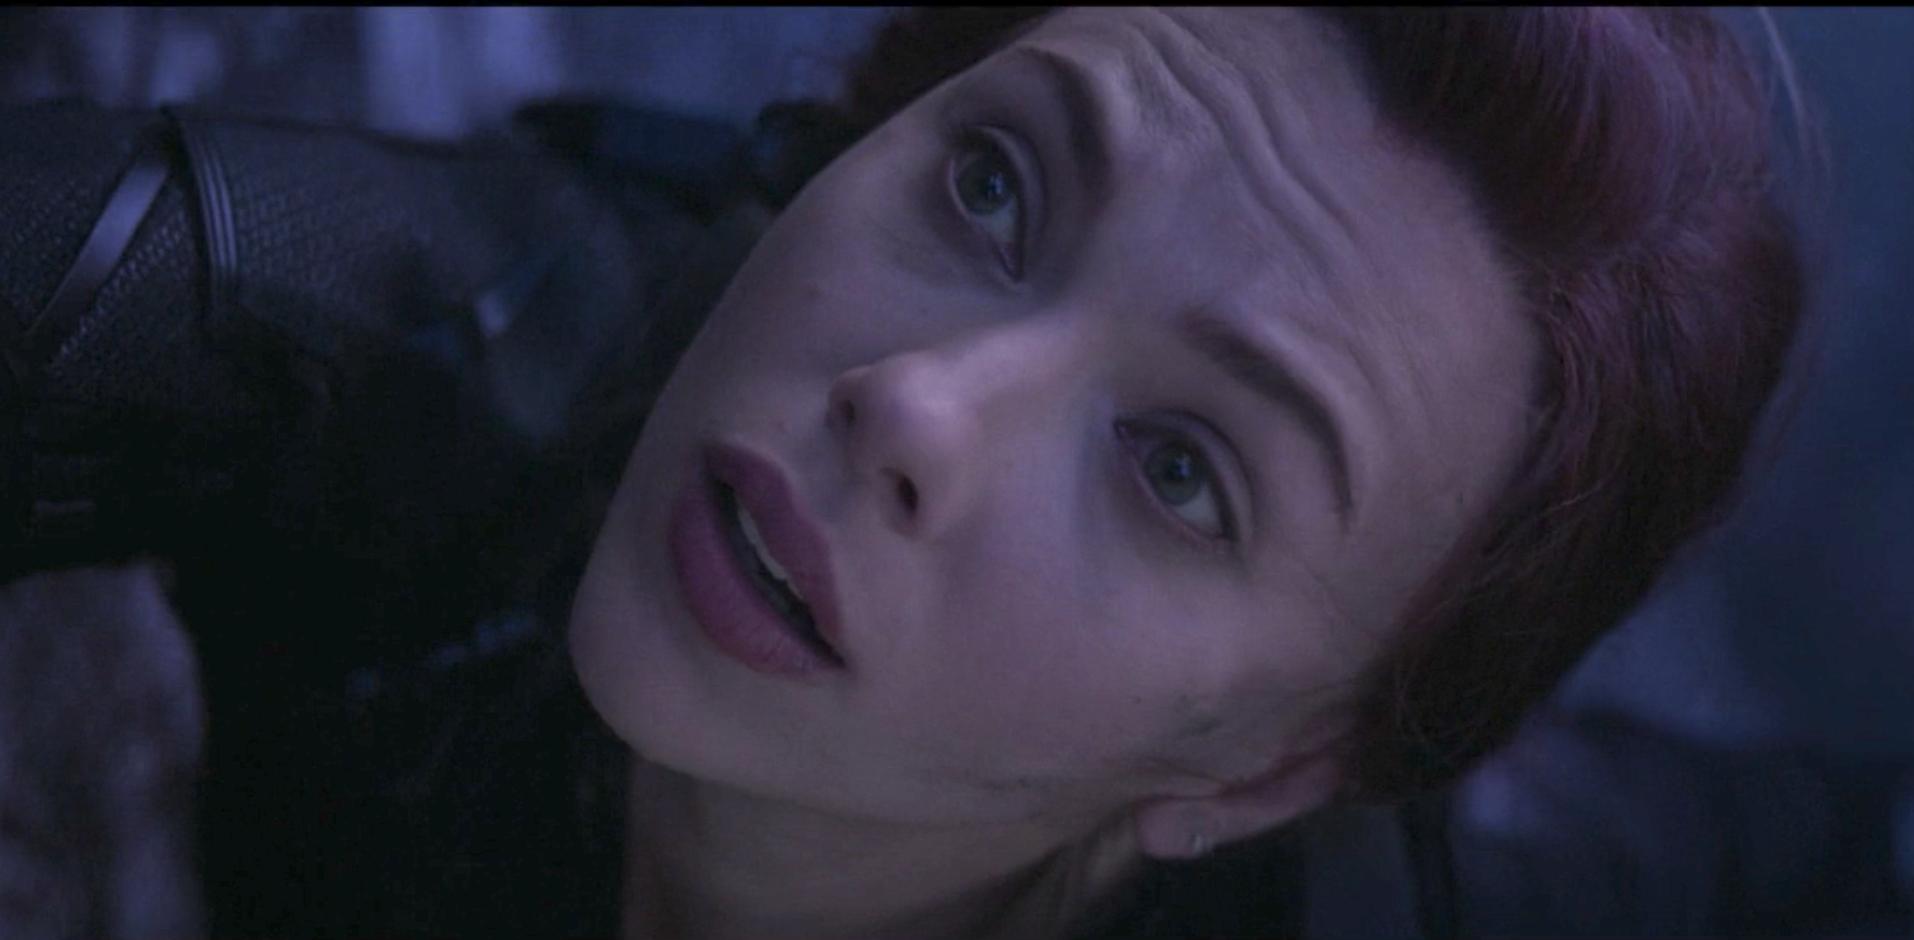 Natasha holding onto Clint before she dies